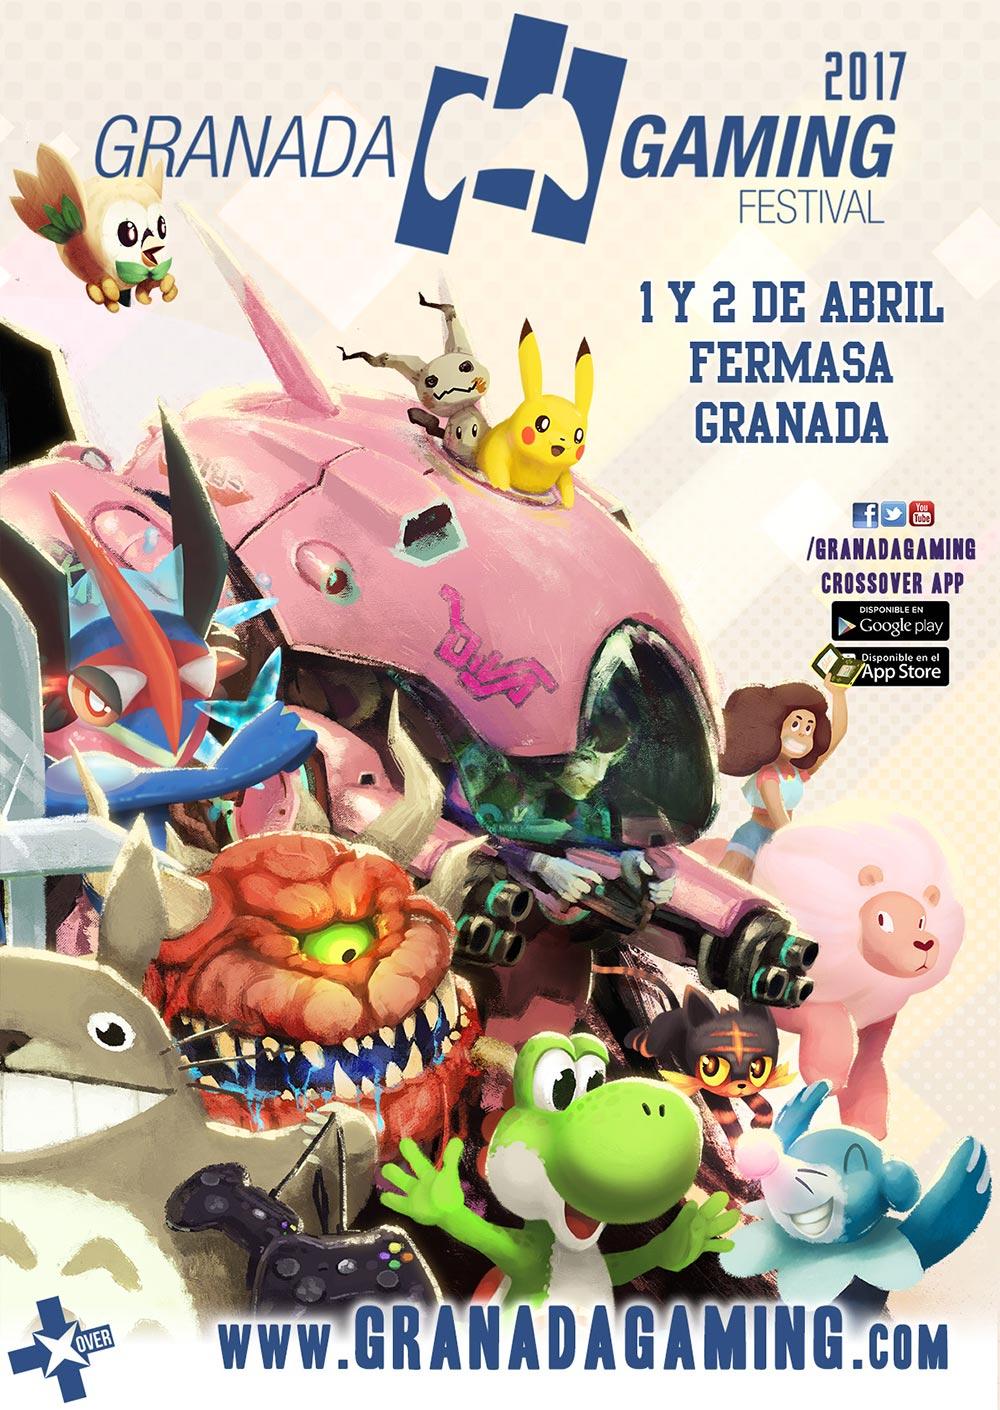 Granada Gaming Festival 2017 - Cartel